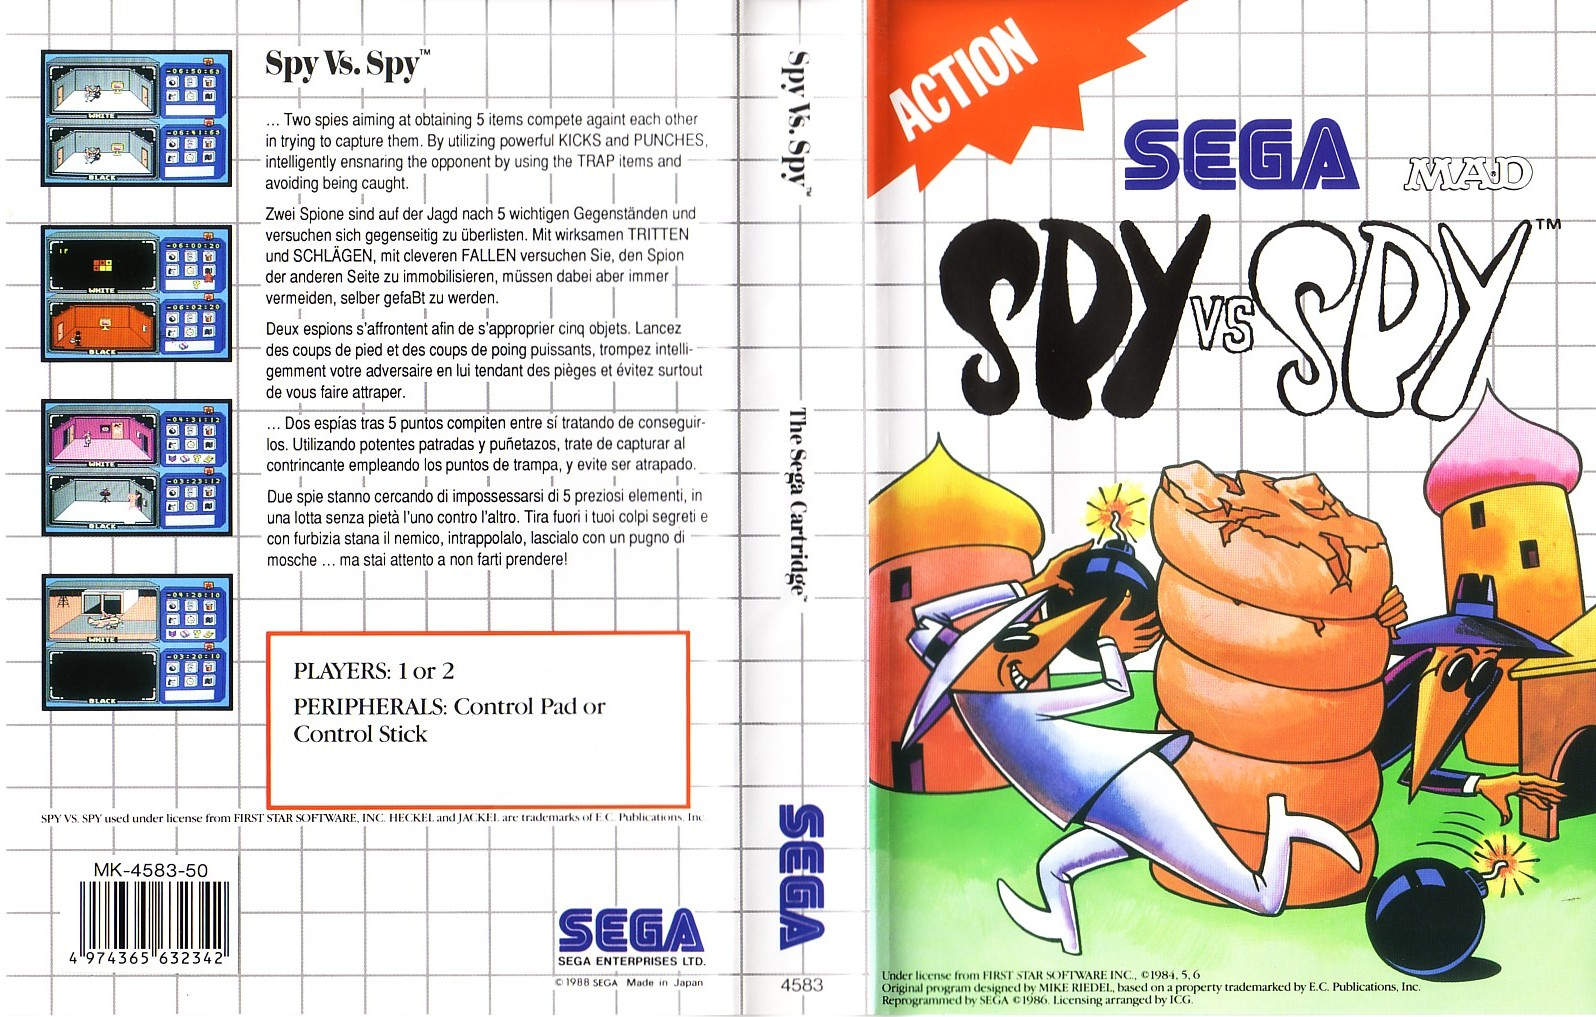 http://www.smspower.org/uploads/Scans/SpyVsSpy-SMS-EU-Cartridge-NoR.jpg